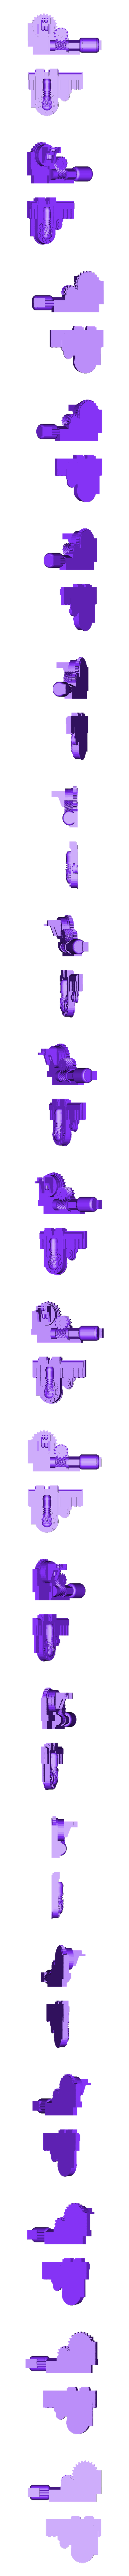 mk_d-4lt_pc_turret_rtside.stl Download free STL file Big Plasma Cannon Turret • 3D printing design, JtStrait72